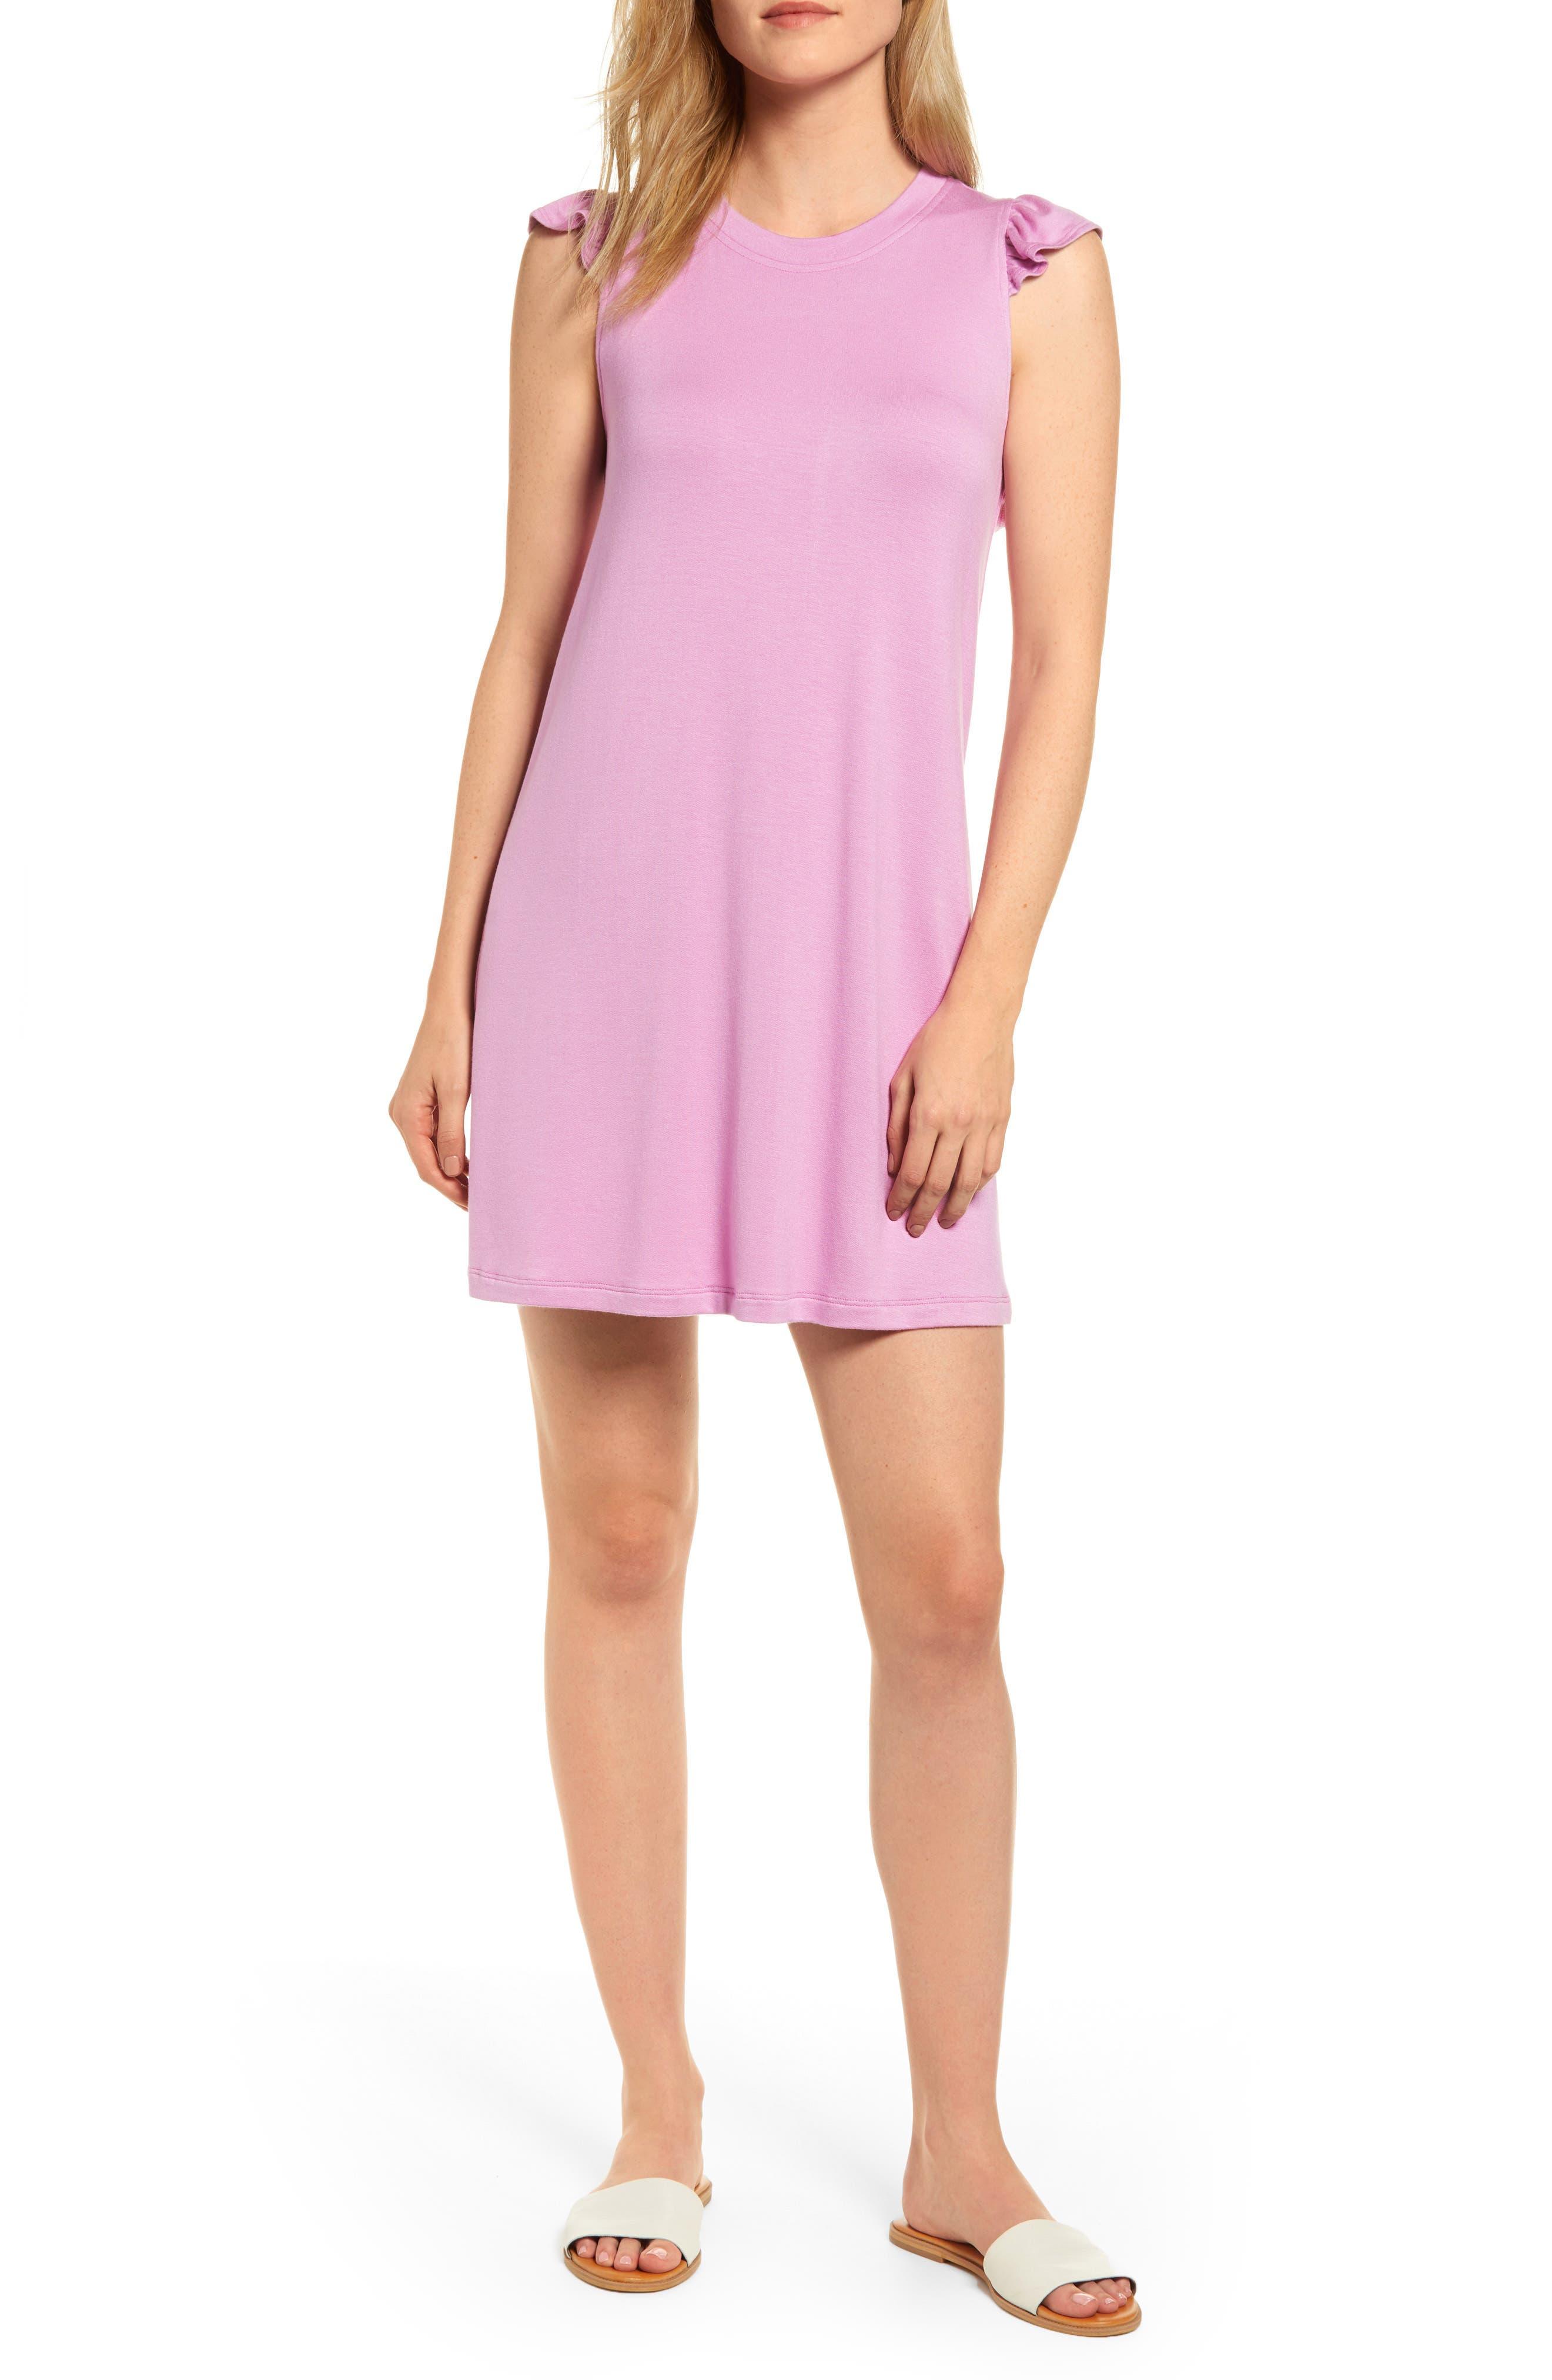 x Hi Sugarplum! Laguna Soft Jersey Ruffle Back T-Shirt Dress,                             Main thumbnail 1, color,                             PEONY